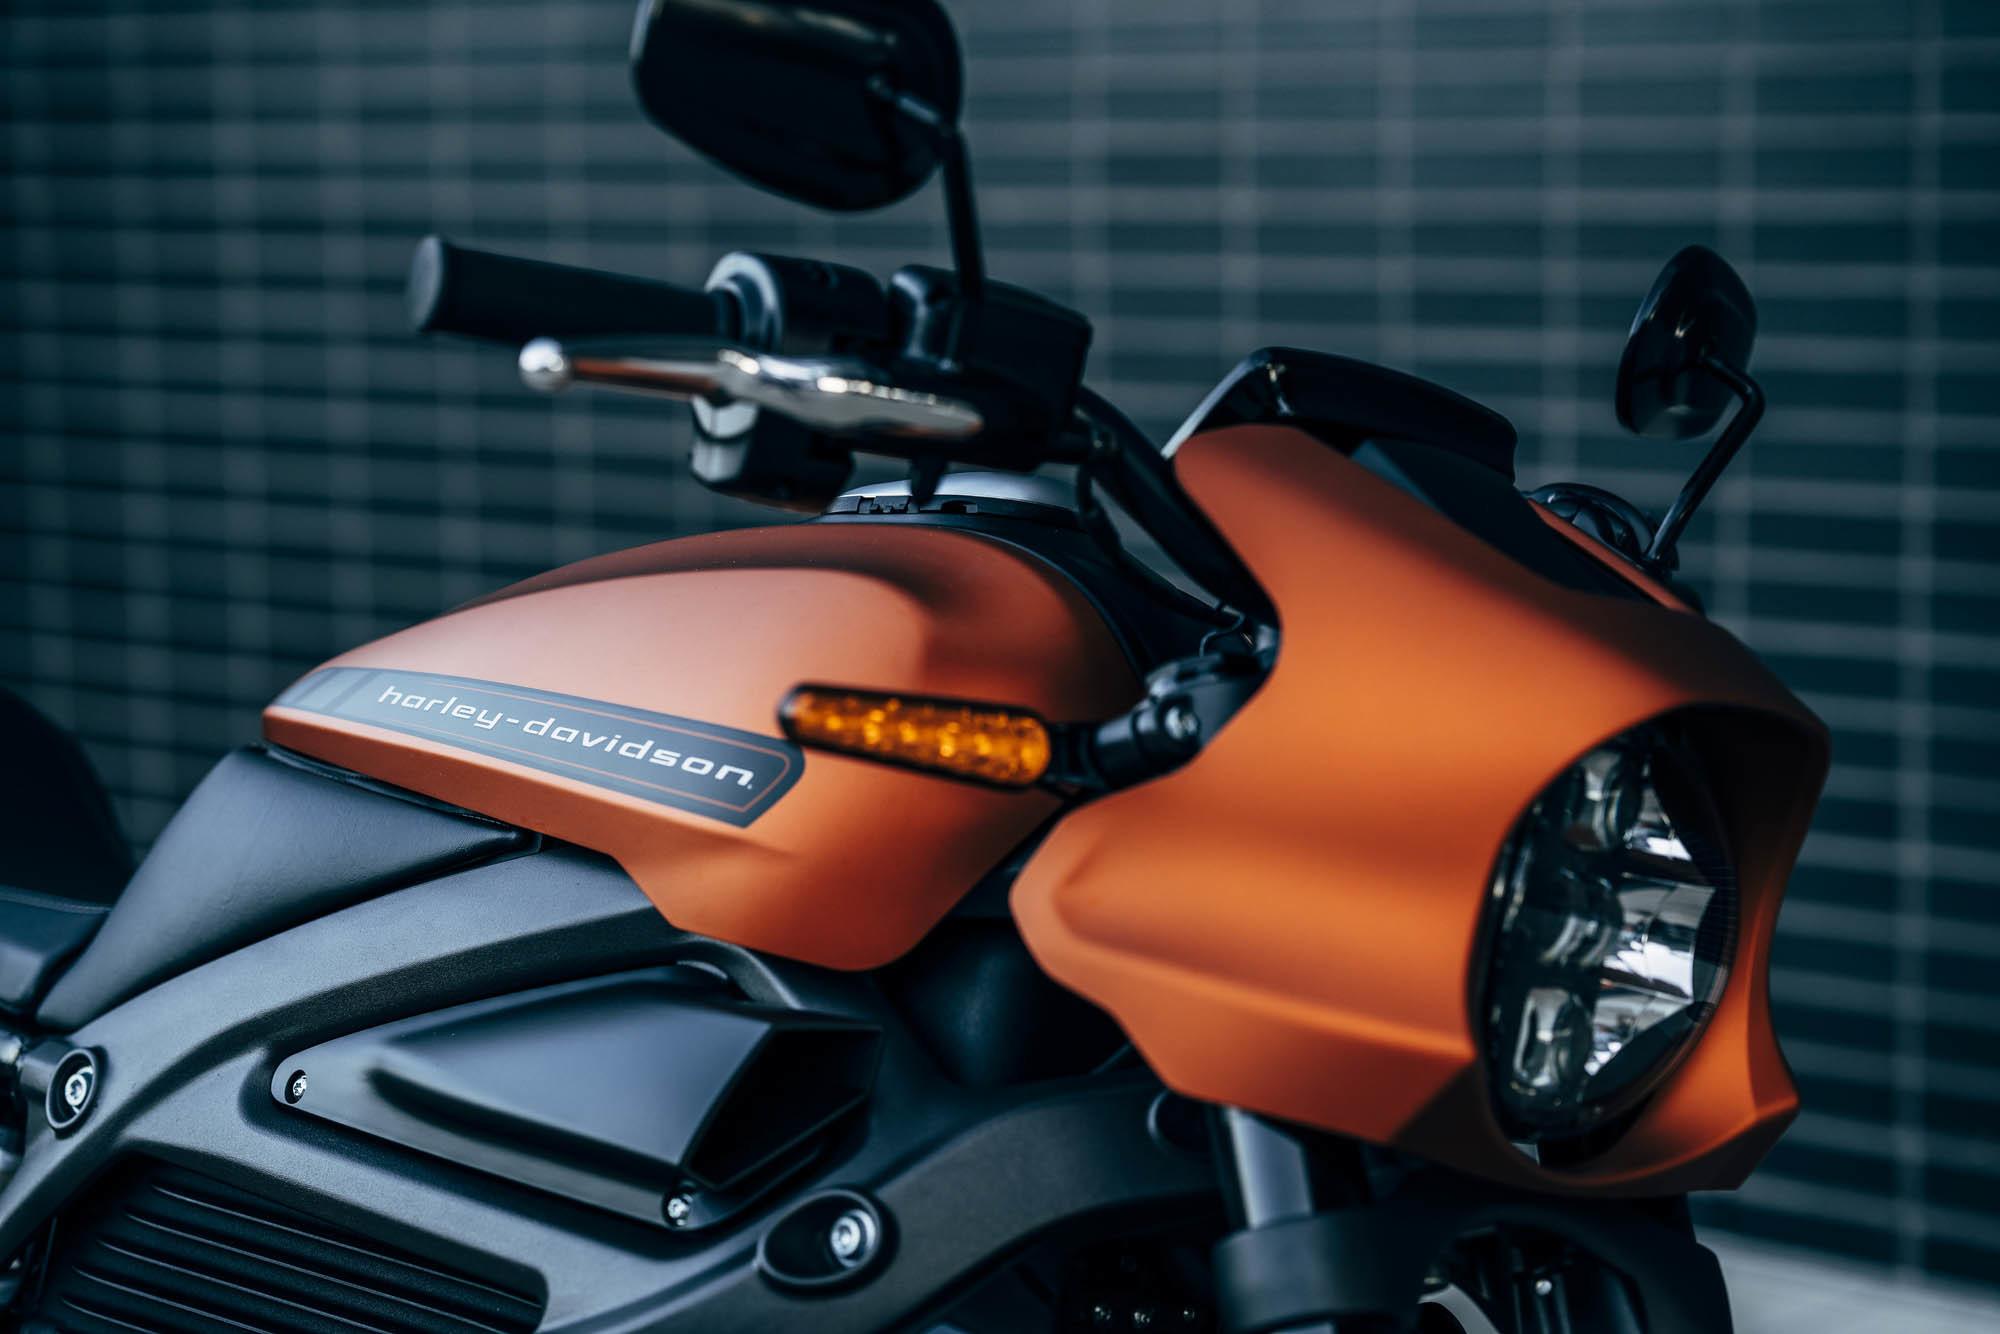 harley-davidson прекратил производство собственного электромотоцикла